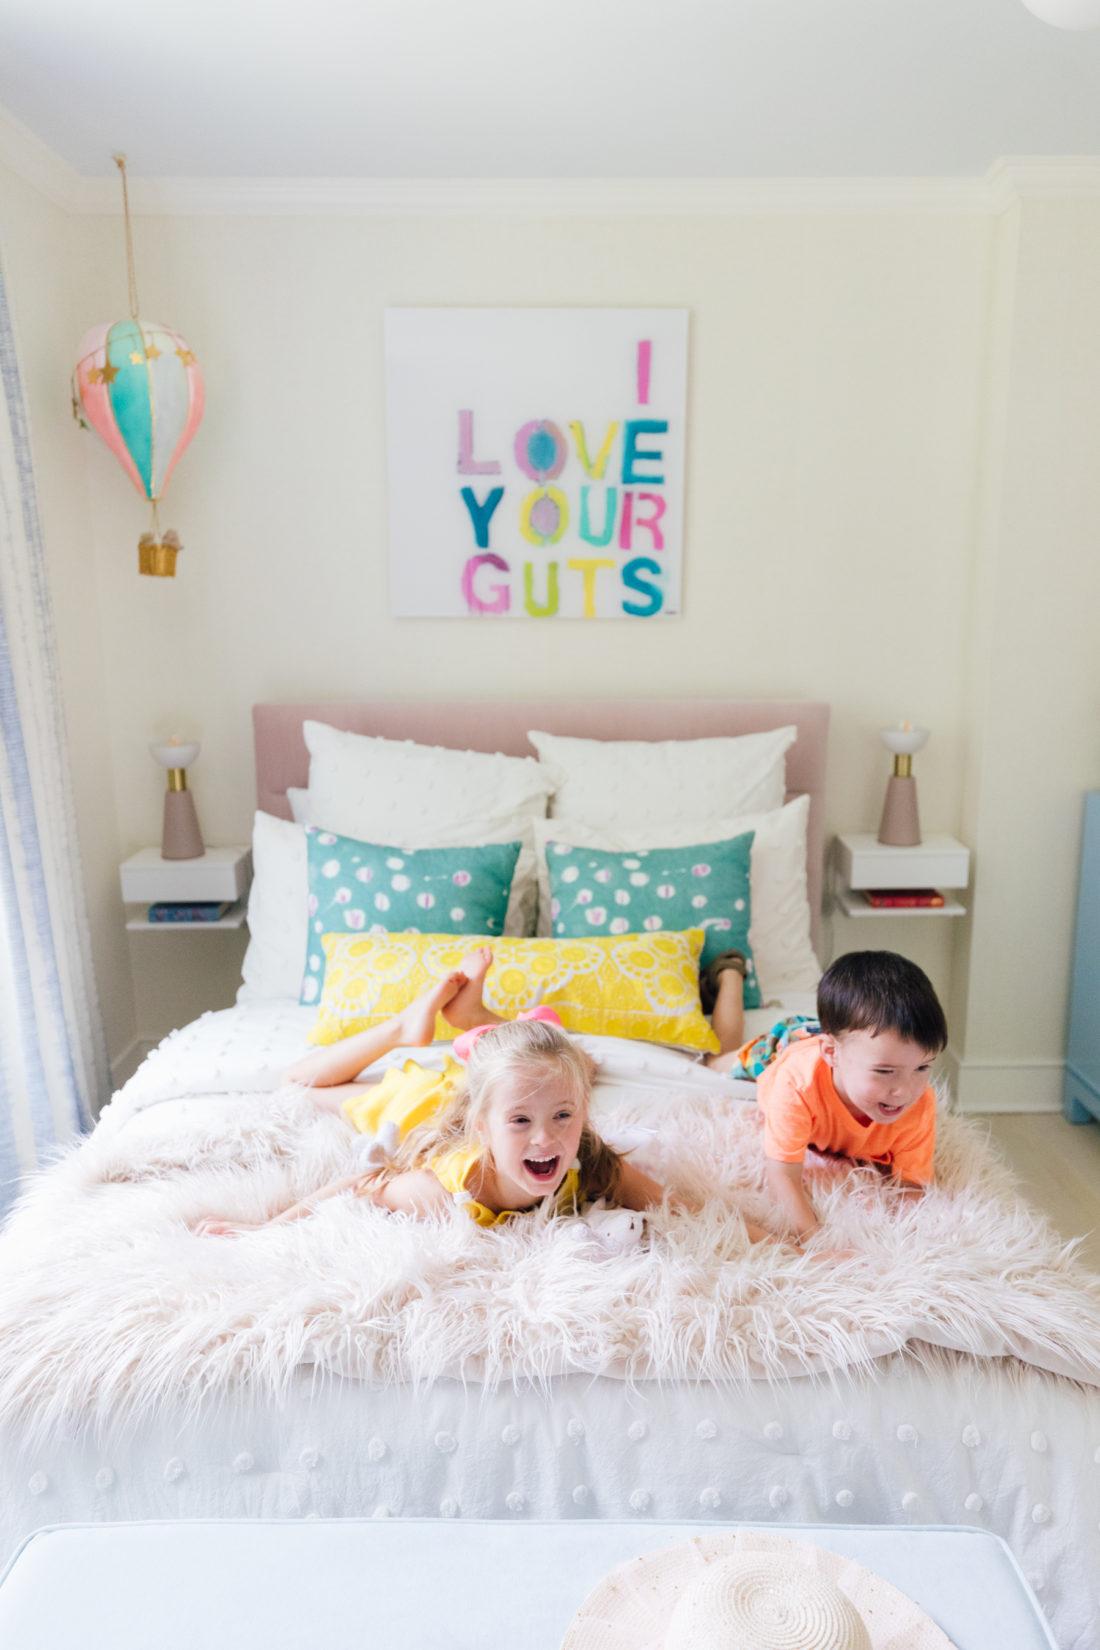 Marlowe and Major Martino jump around Marlowe's new colorful bedroom